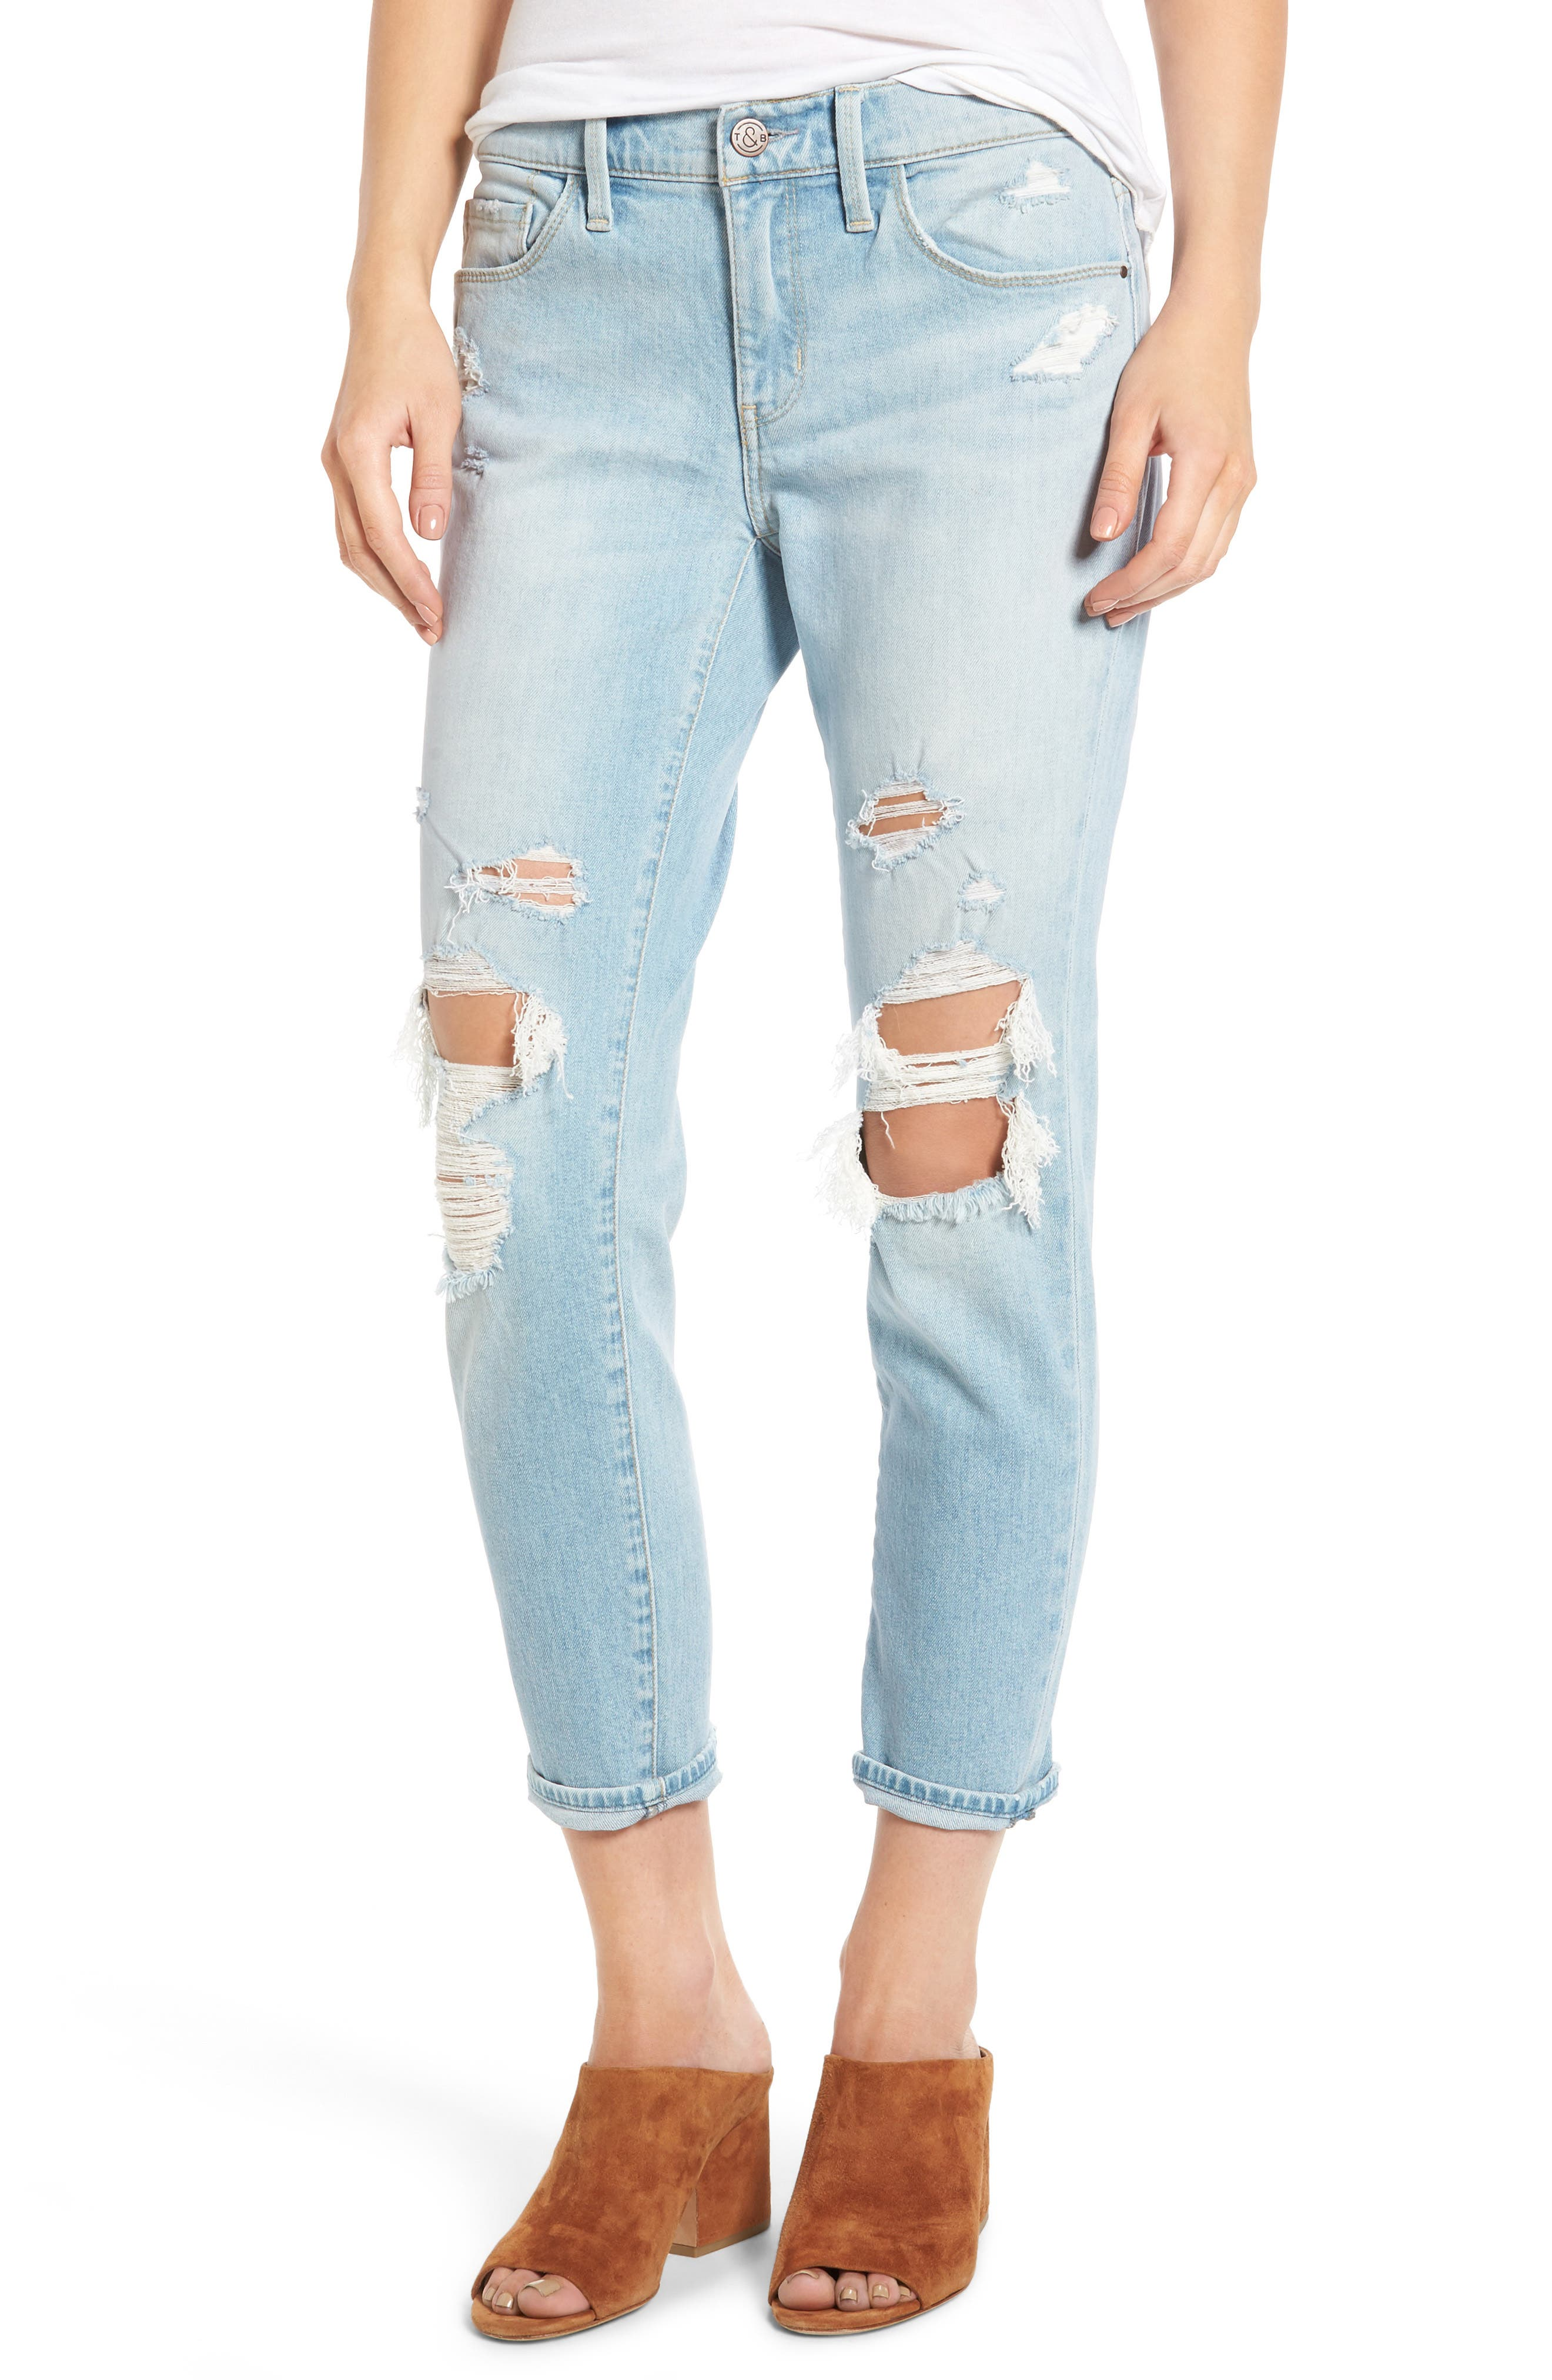 TREASURE & BOND,                             Skinny Boyfriend Jeans,                             Main thumbnail 1, color,                             400